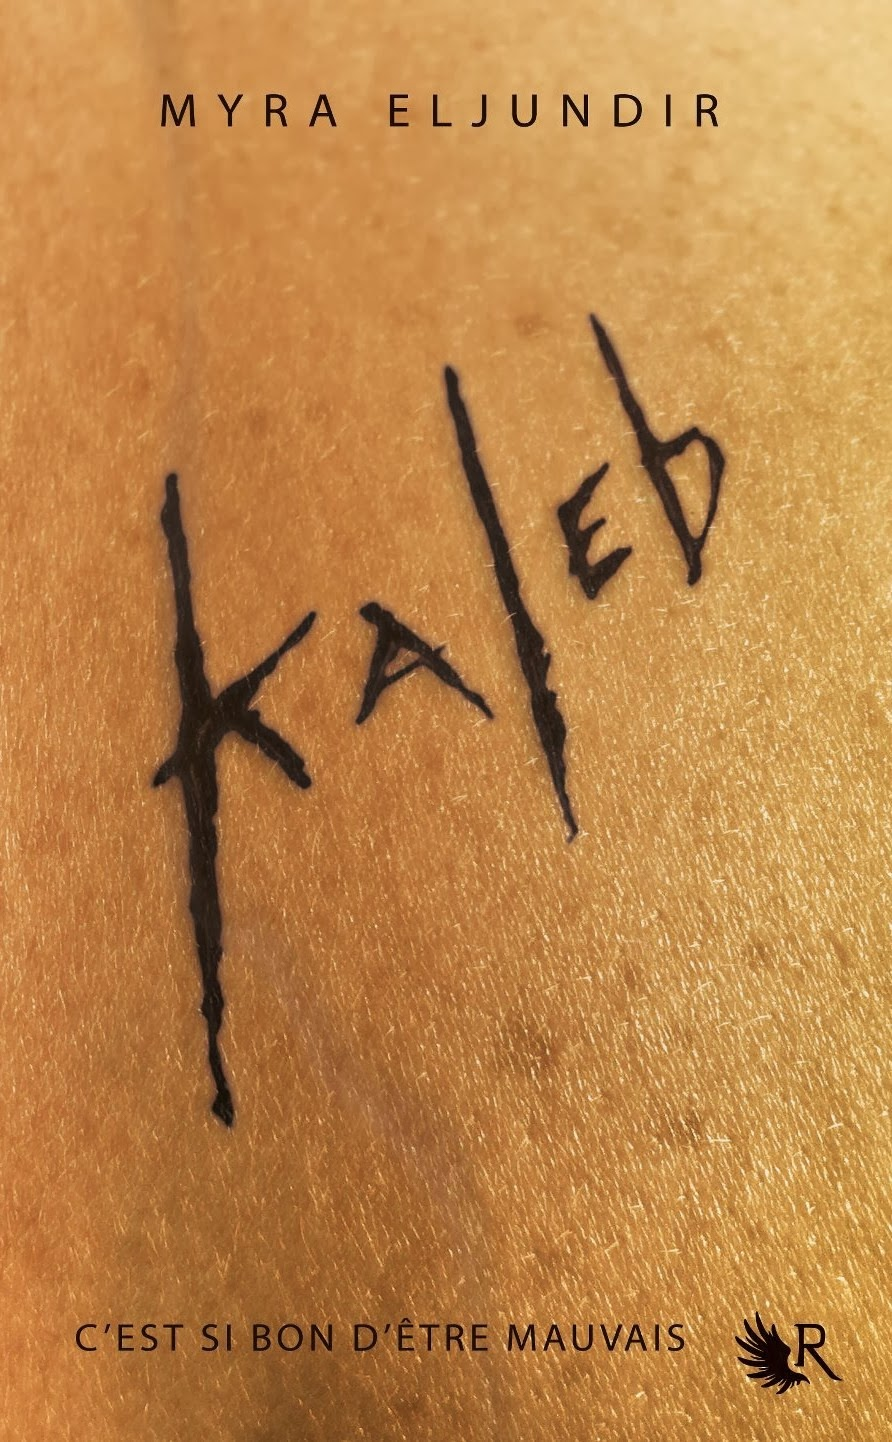 http://lesouffledesmots.blogspot.fr/2014/02/kaleb-myra-eljundir.html